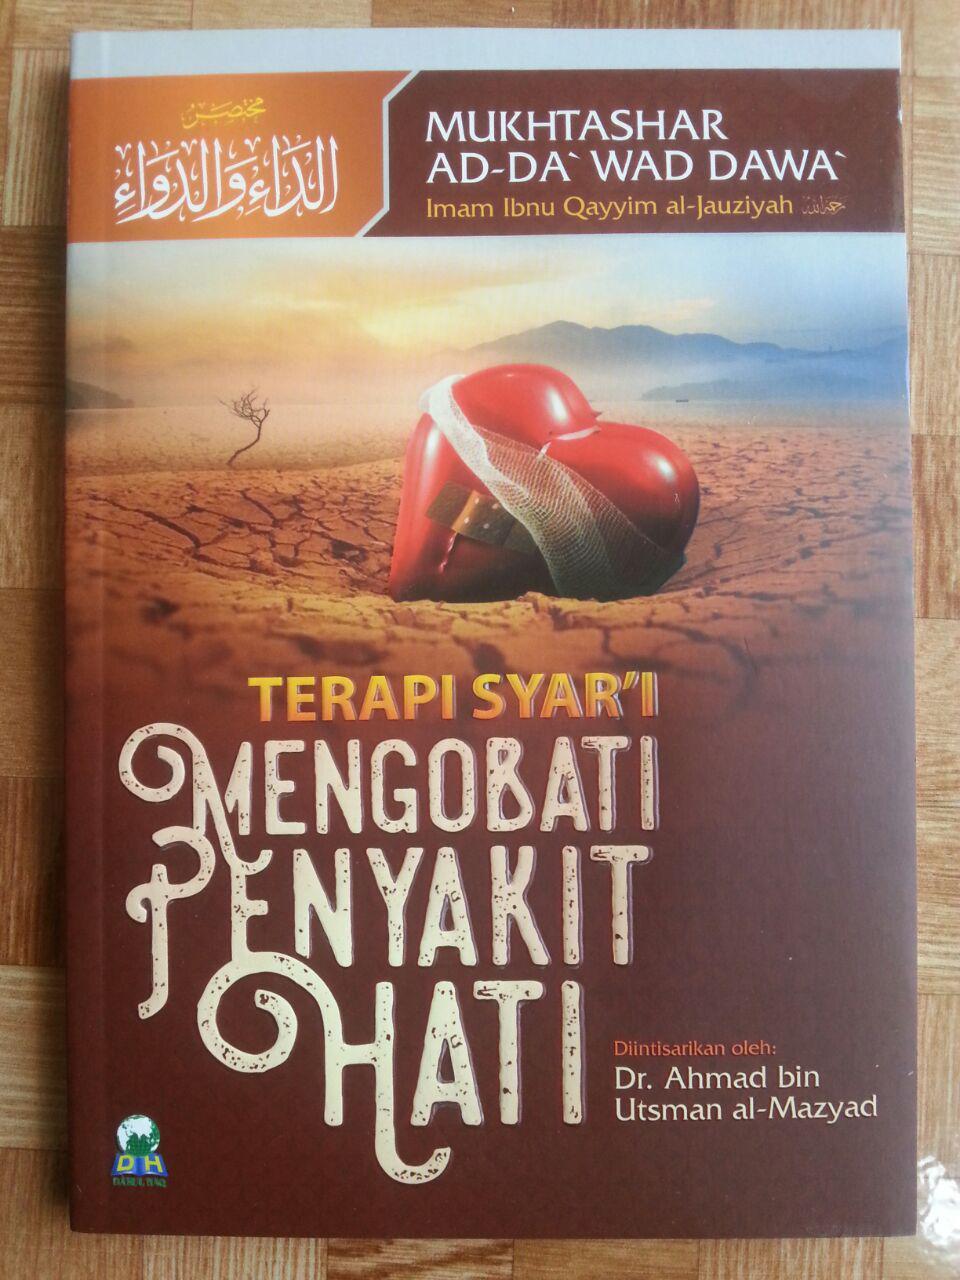 Buku Terapi Syar'i Mengobat Penyakit Hati cover 2